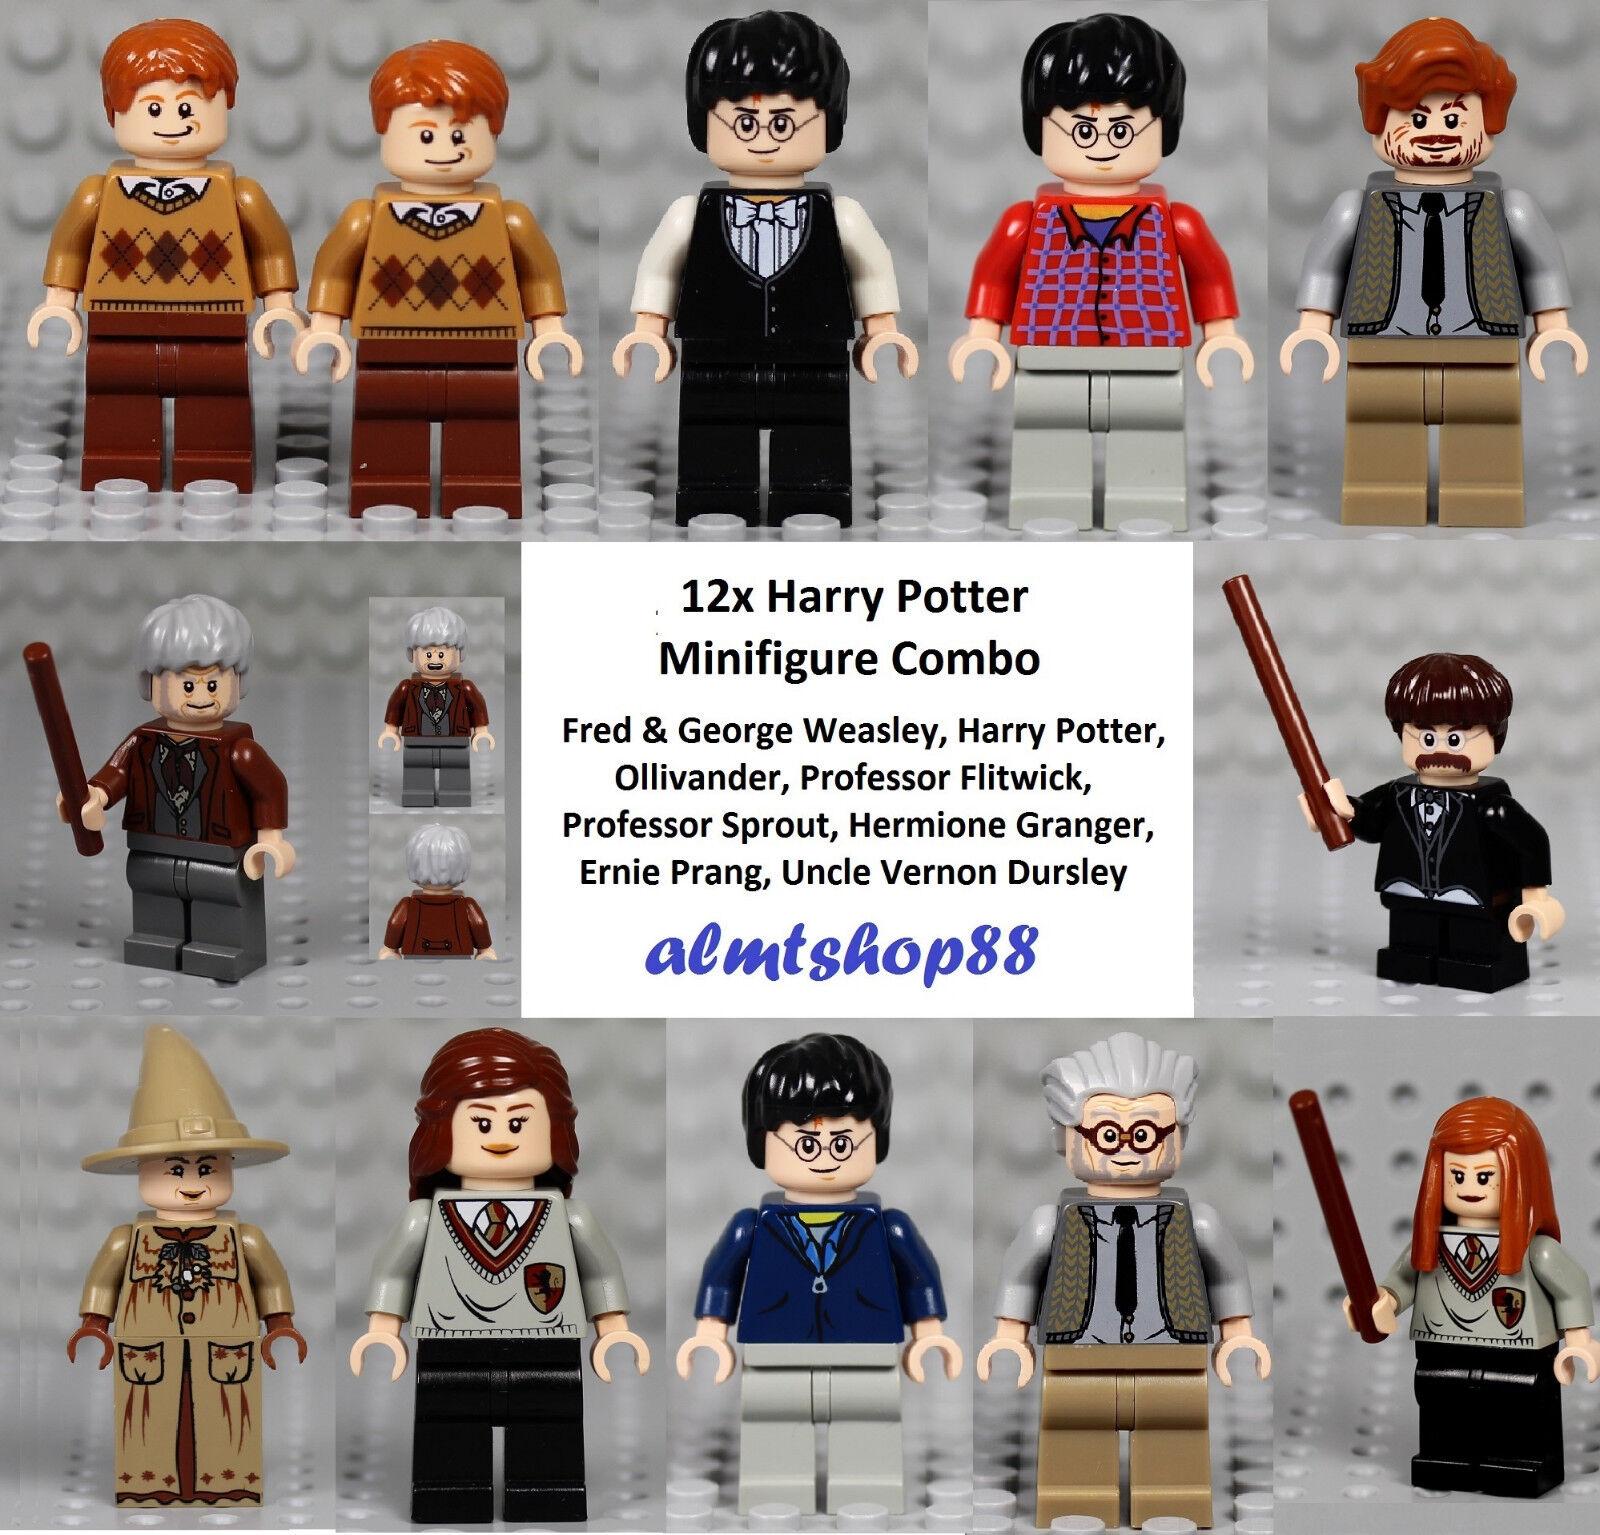 LEGO Harry Potter - 12x Minifigure Combo Hermione Weasley Ollivander Gryffindor